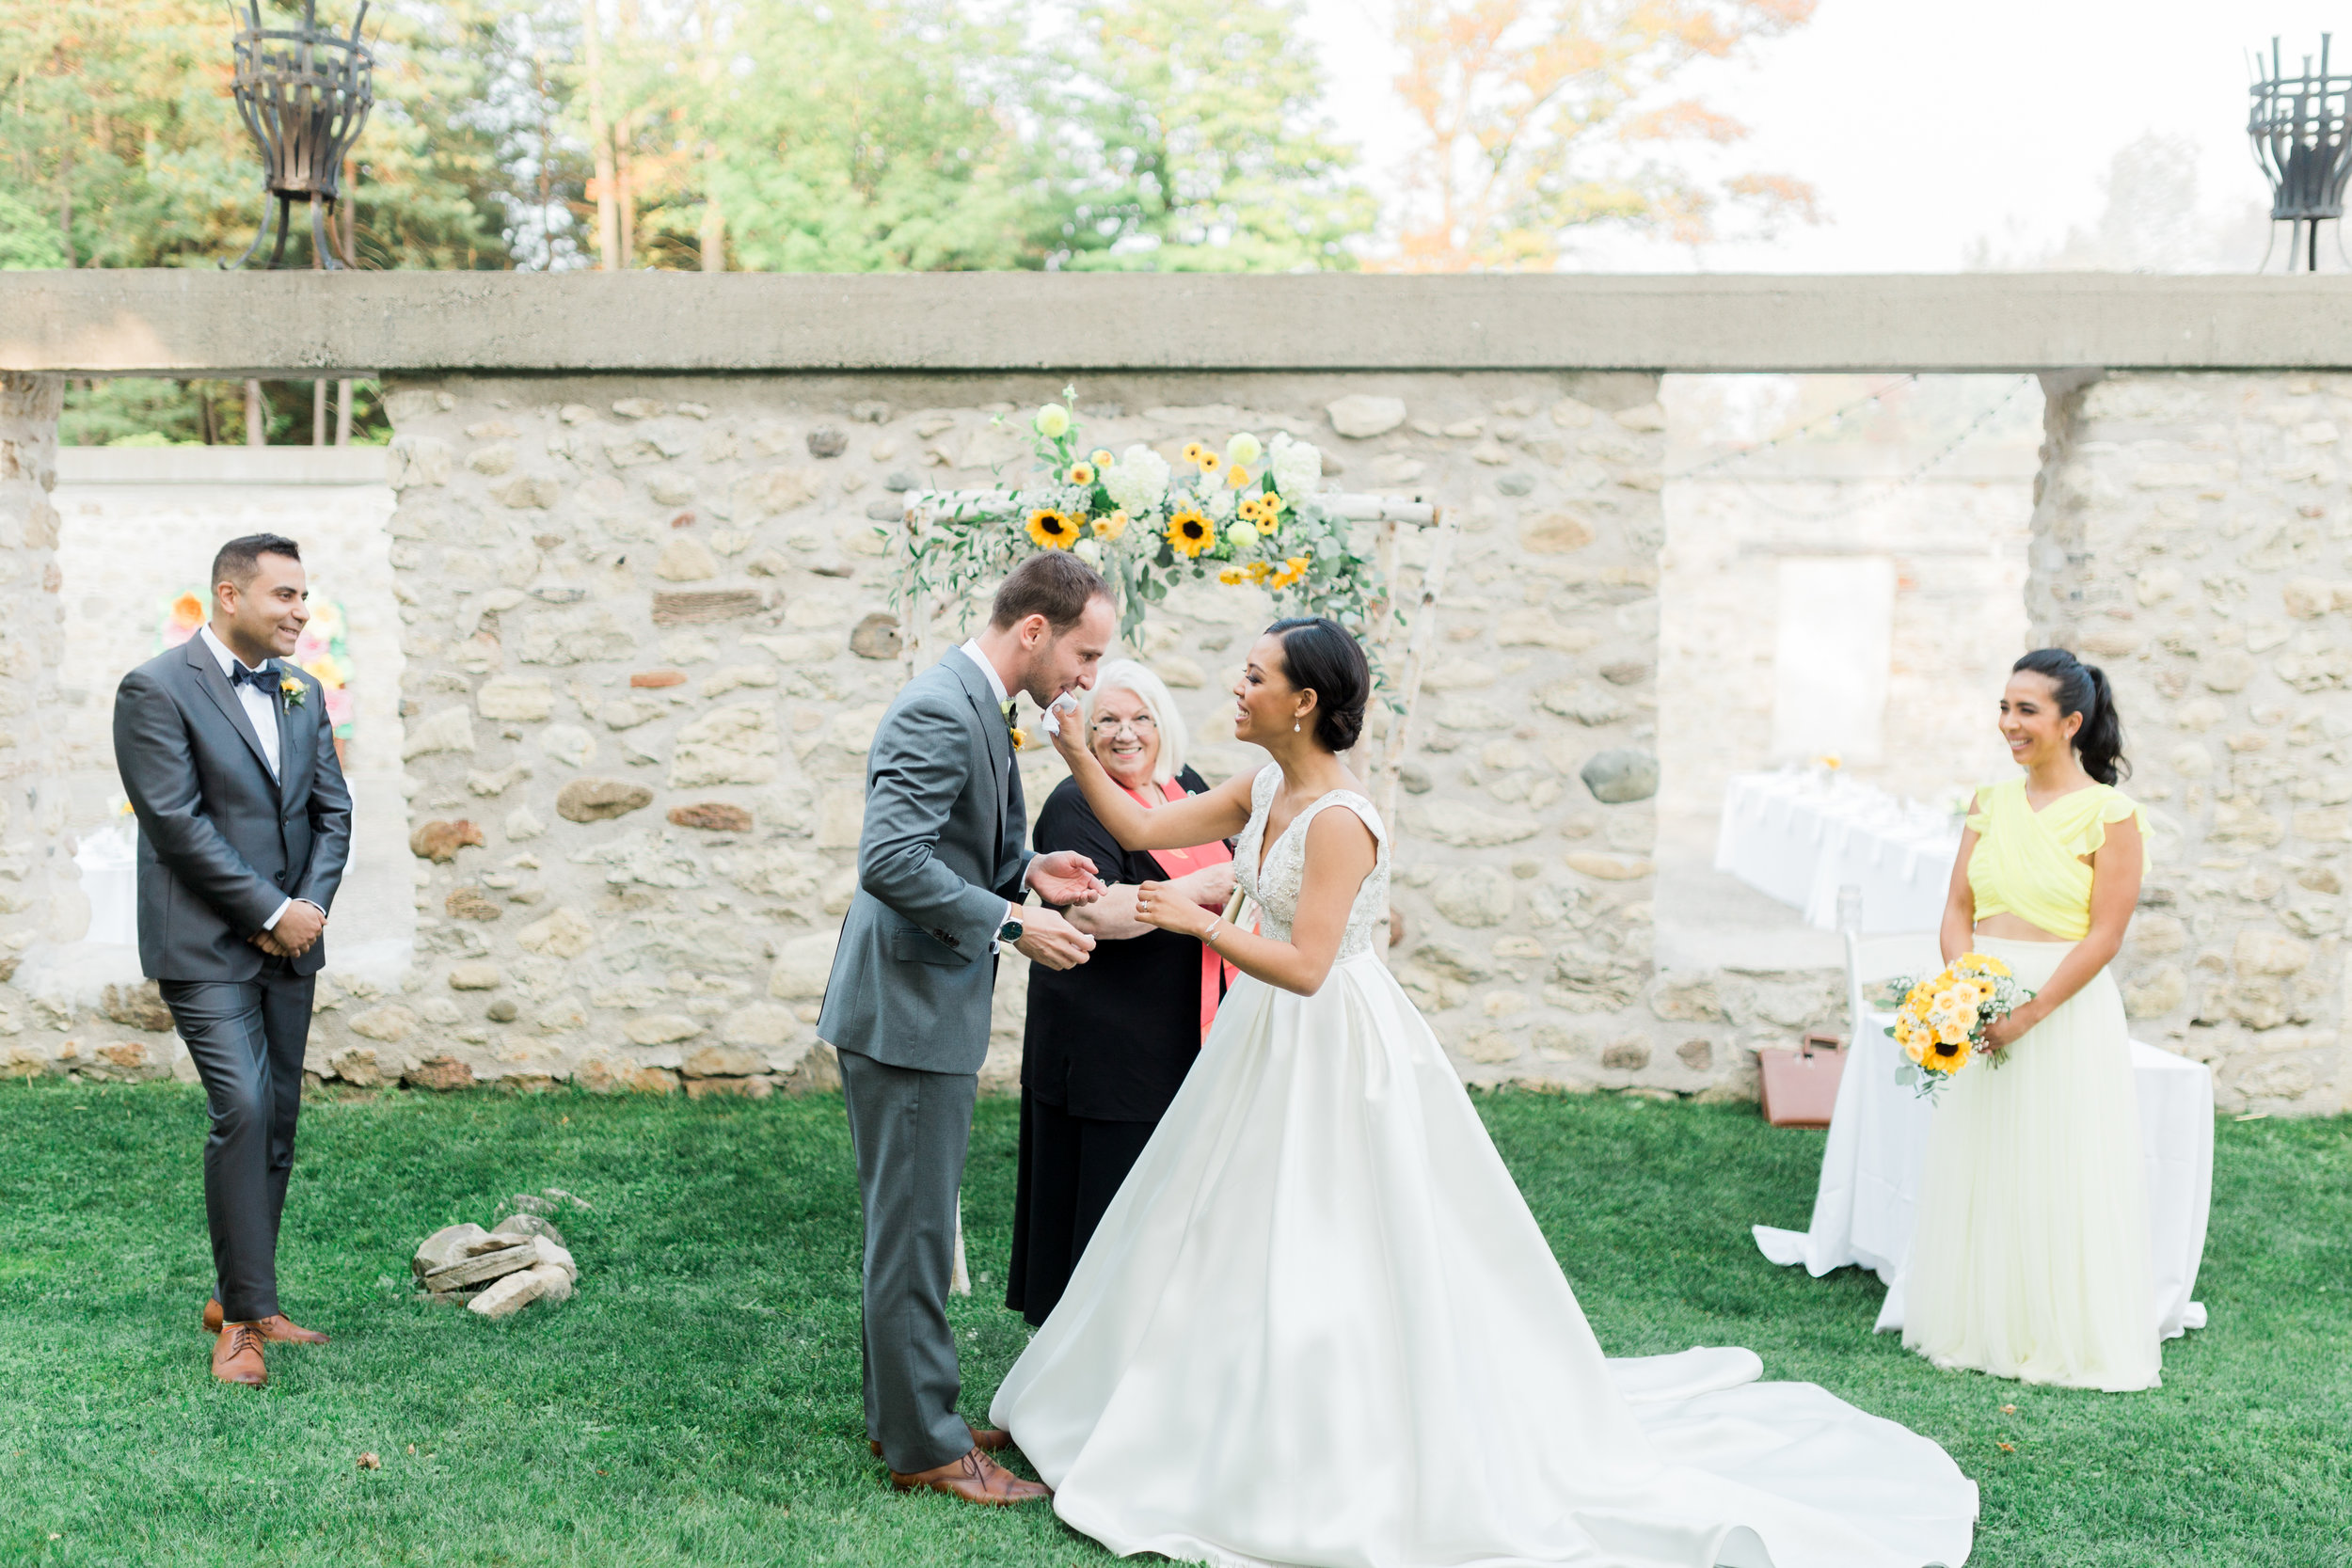 Alton Mills Wedding - Ceremony-67.jpg